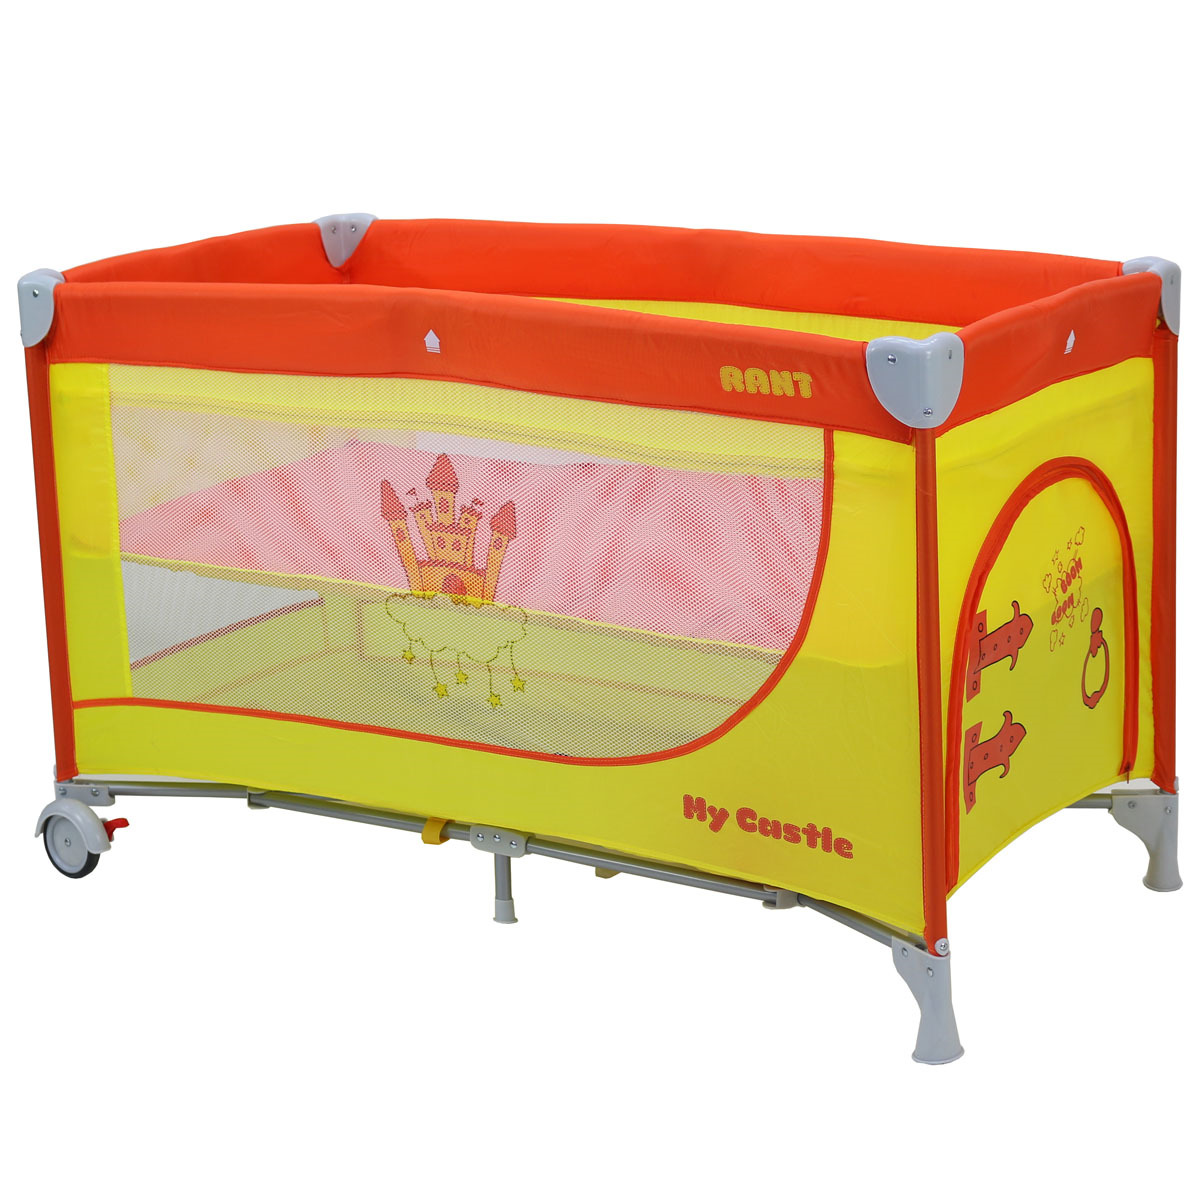 Манеж-кроватка Rant My Castle, желтый, оранжевый